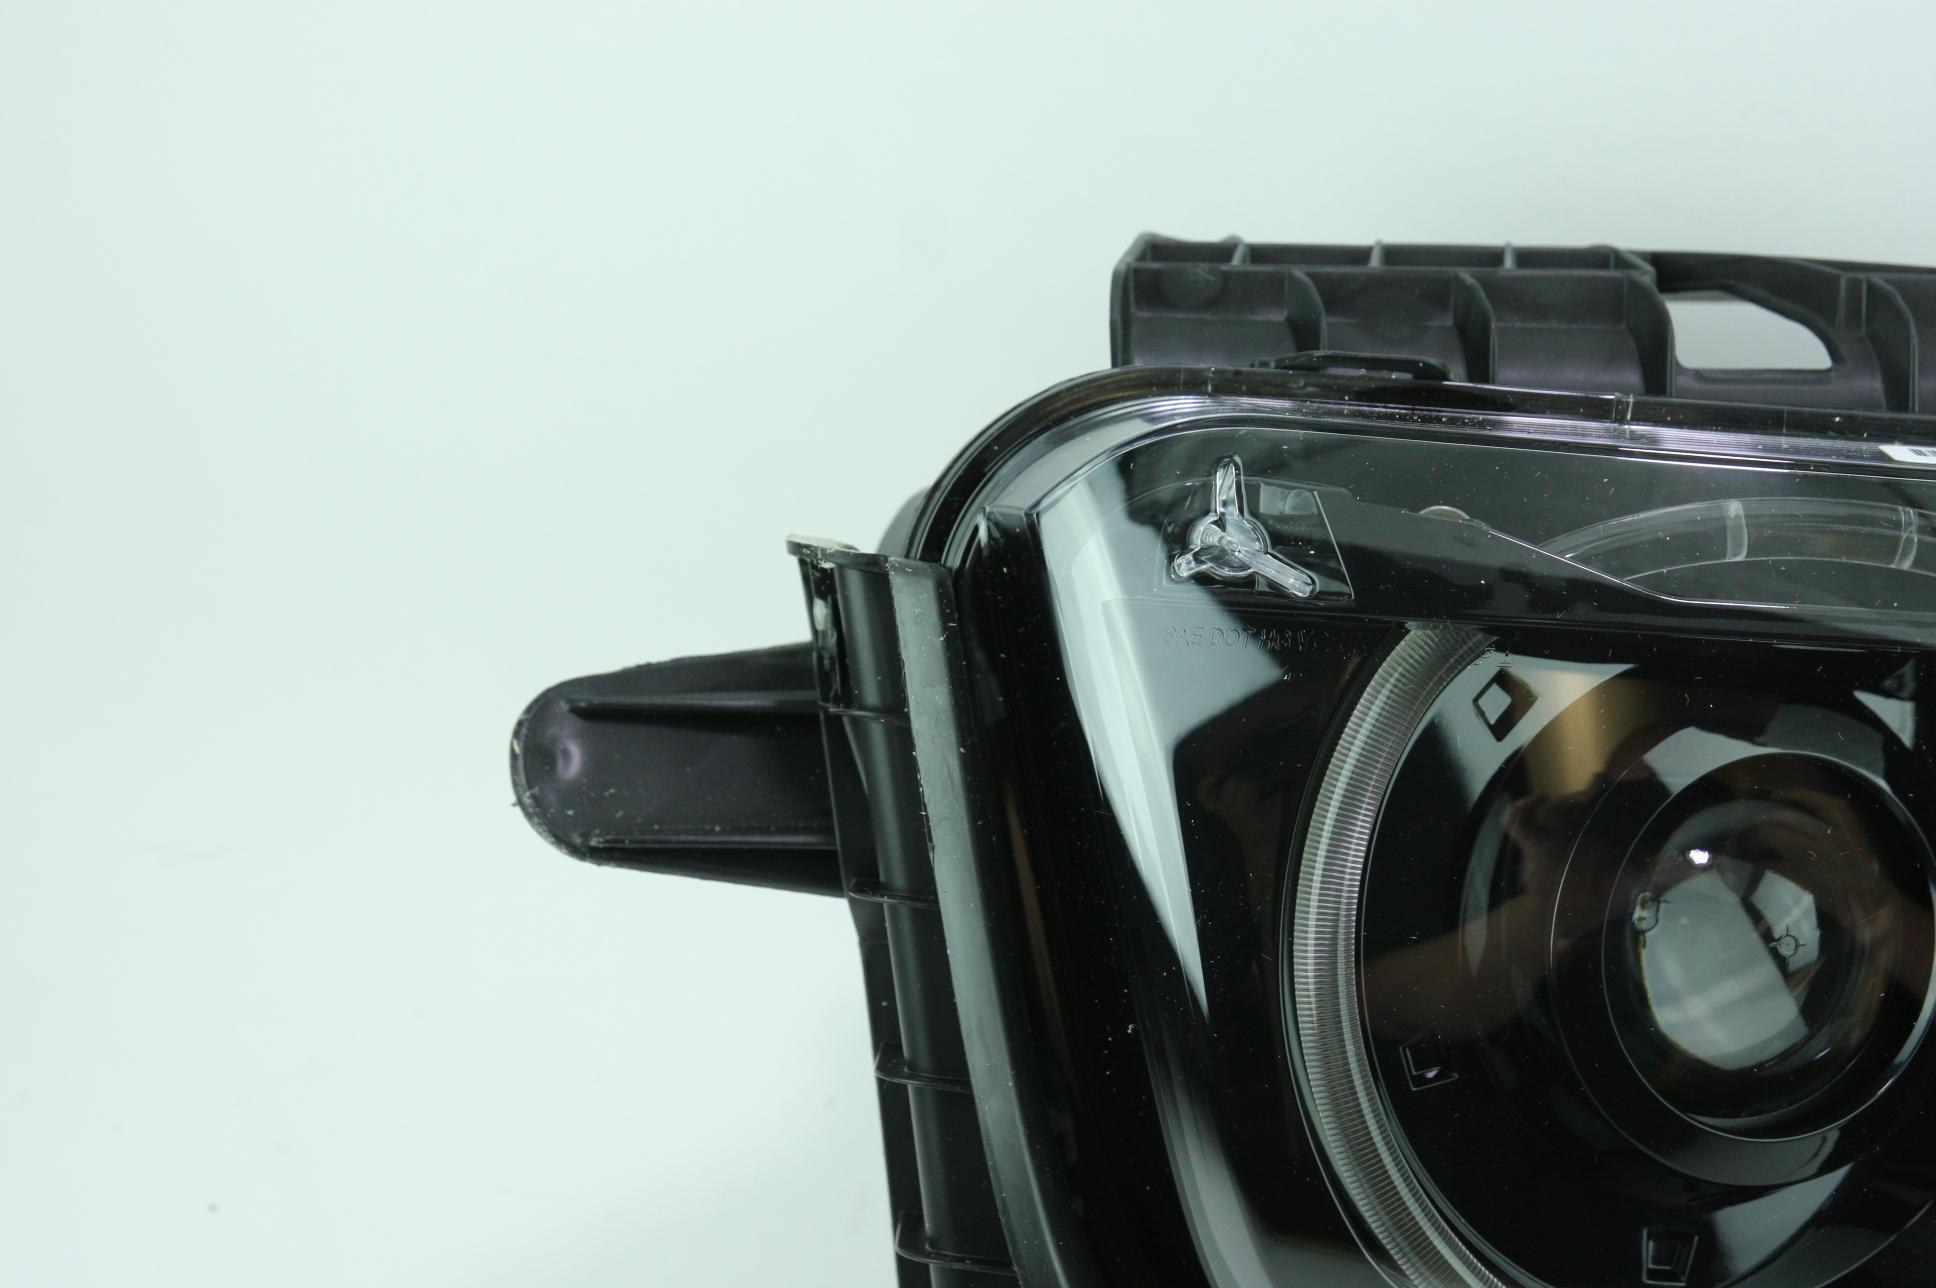 New Genuine OEM GM 22959920 Right Headlight Assembly 10-15 Chevy Camaro NIP - image 6